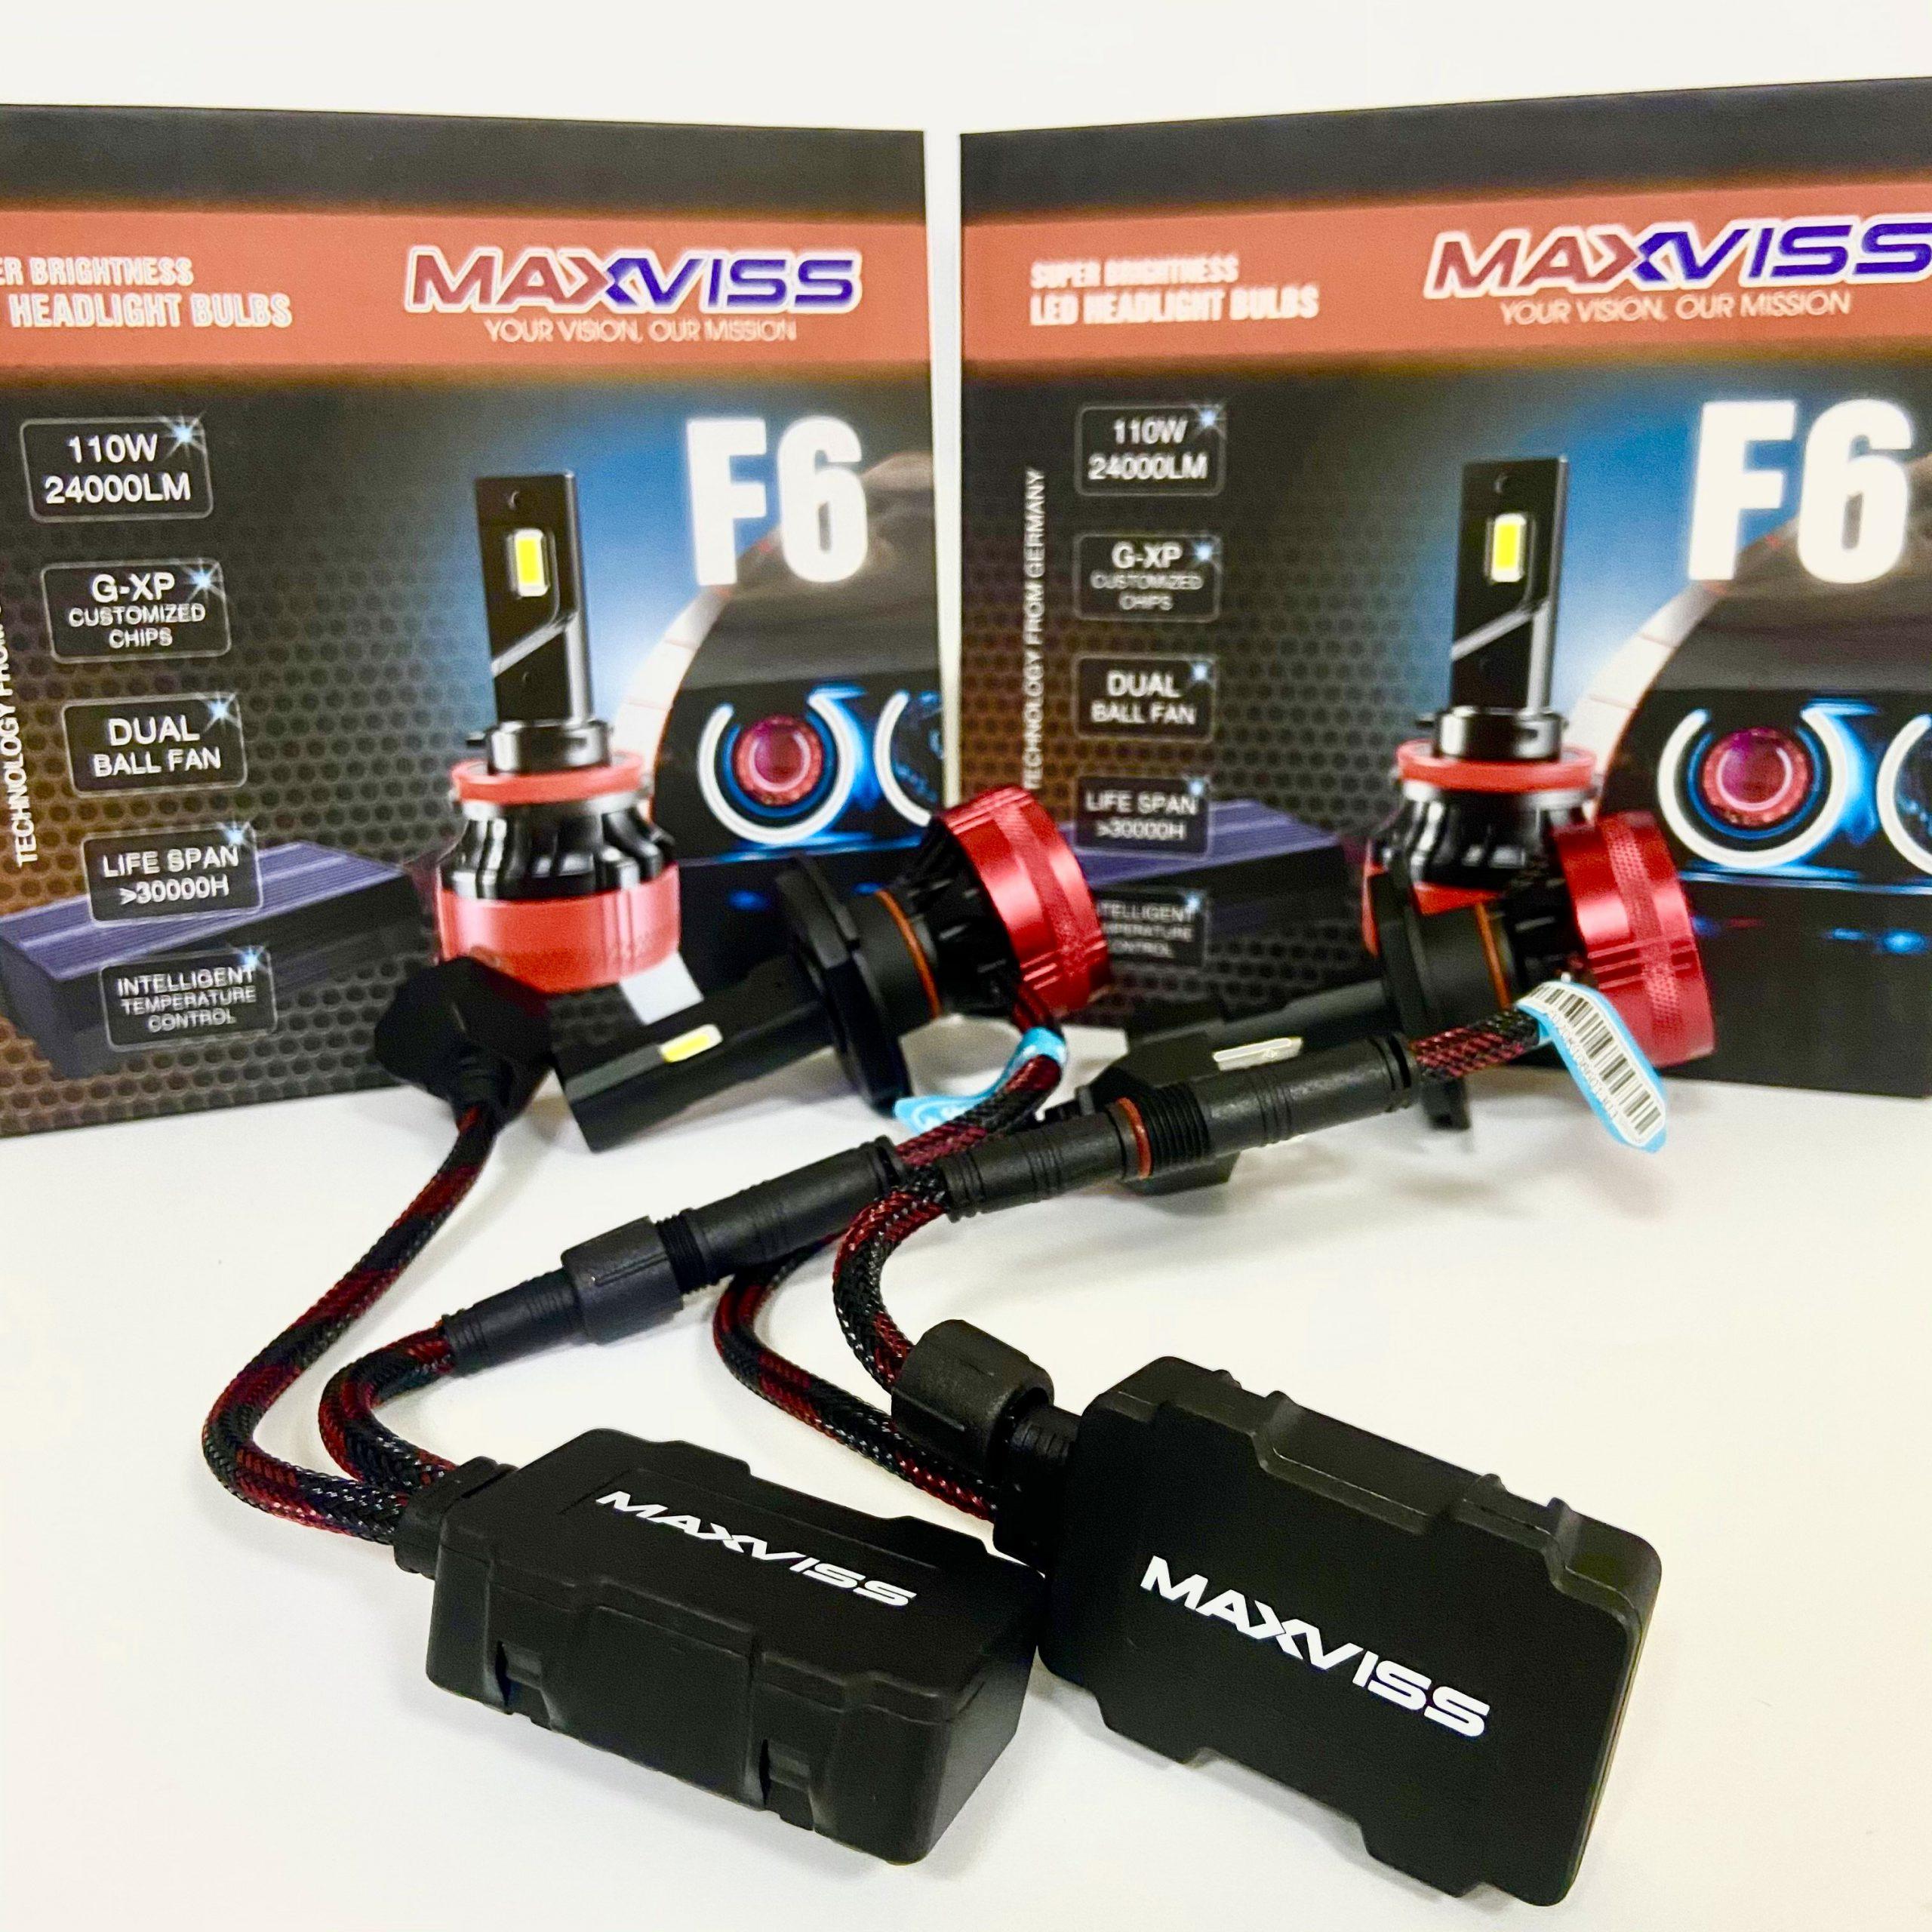 bong-den-led-maxviss-f6